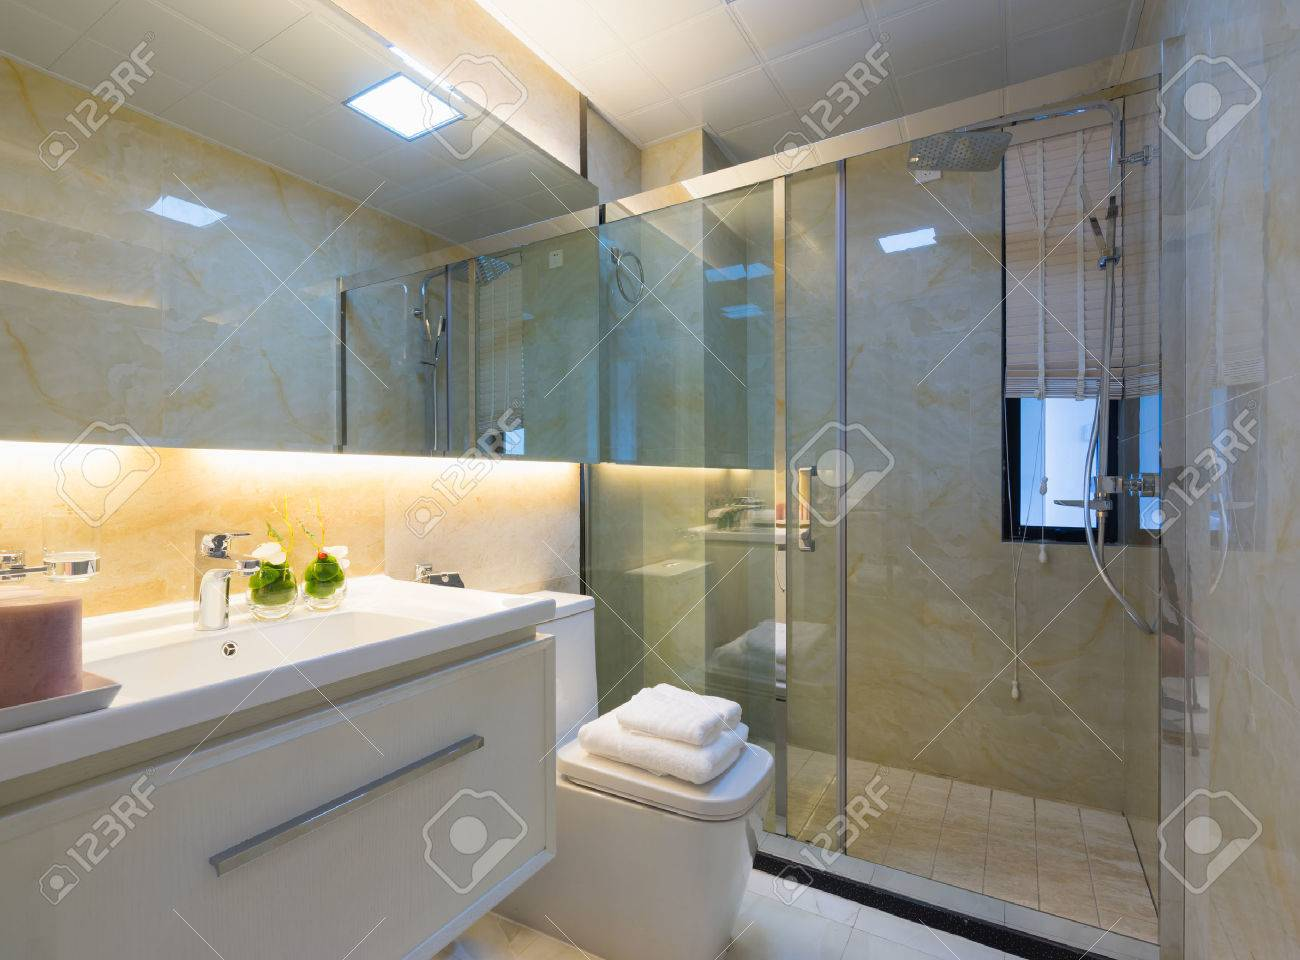 modern bathroom with nice decoration Standard-Bild - 39461264